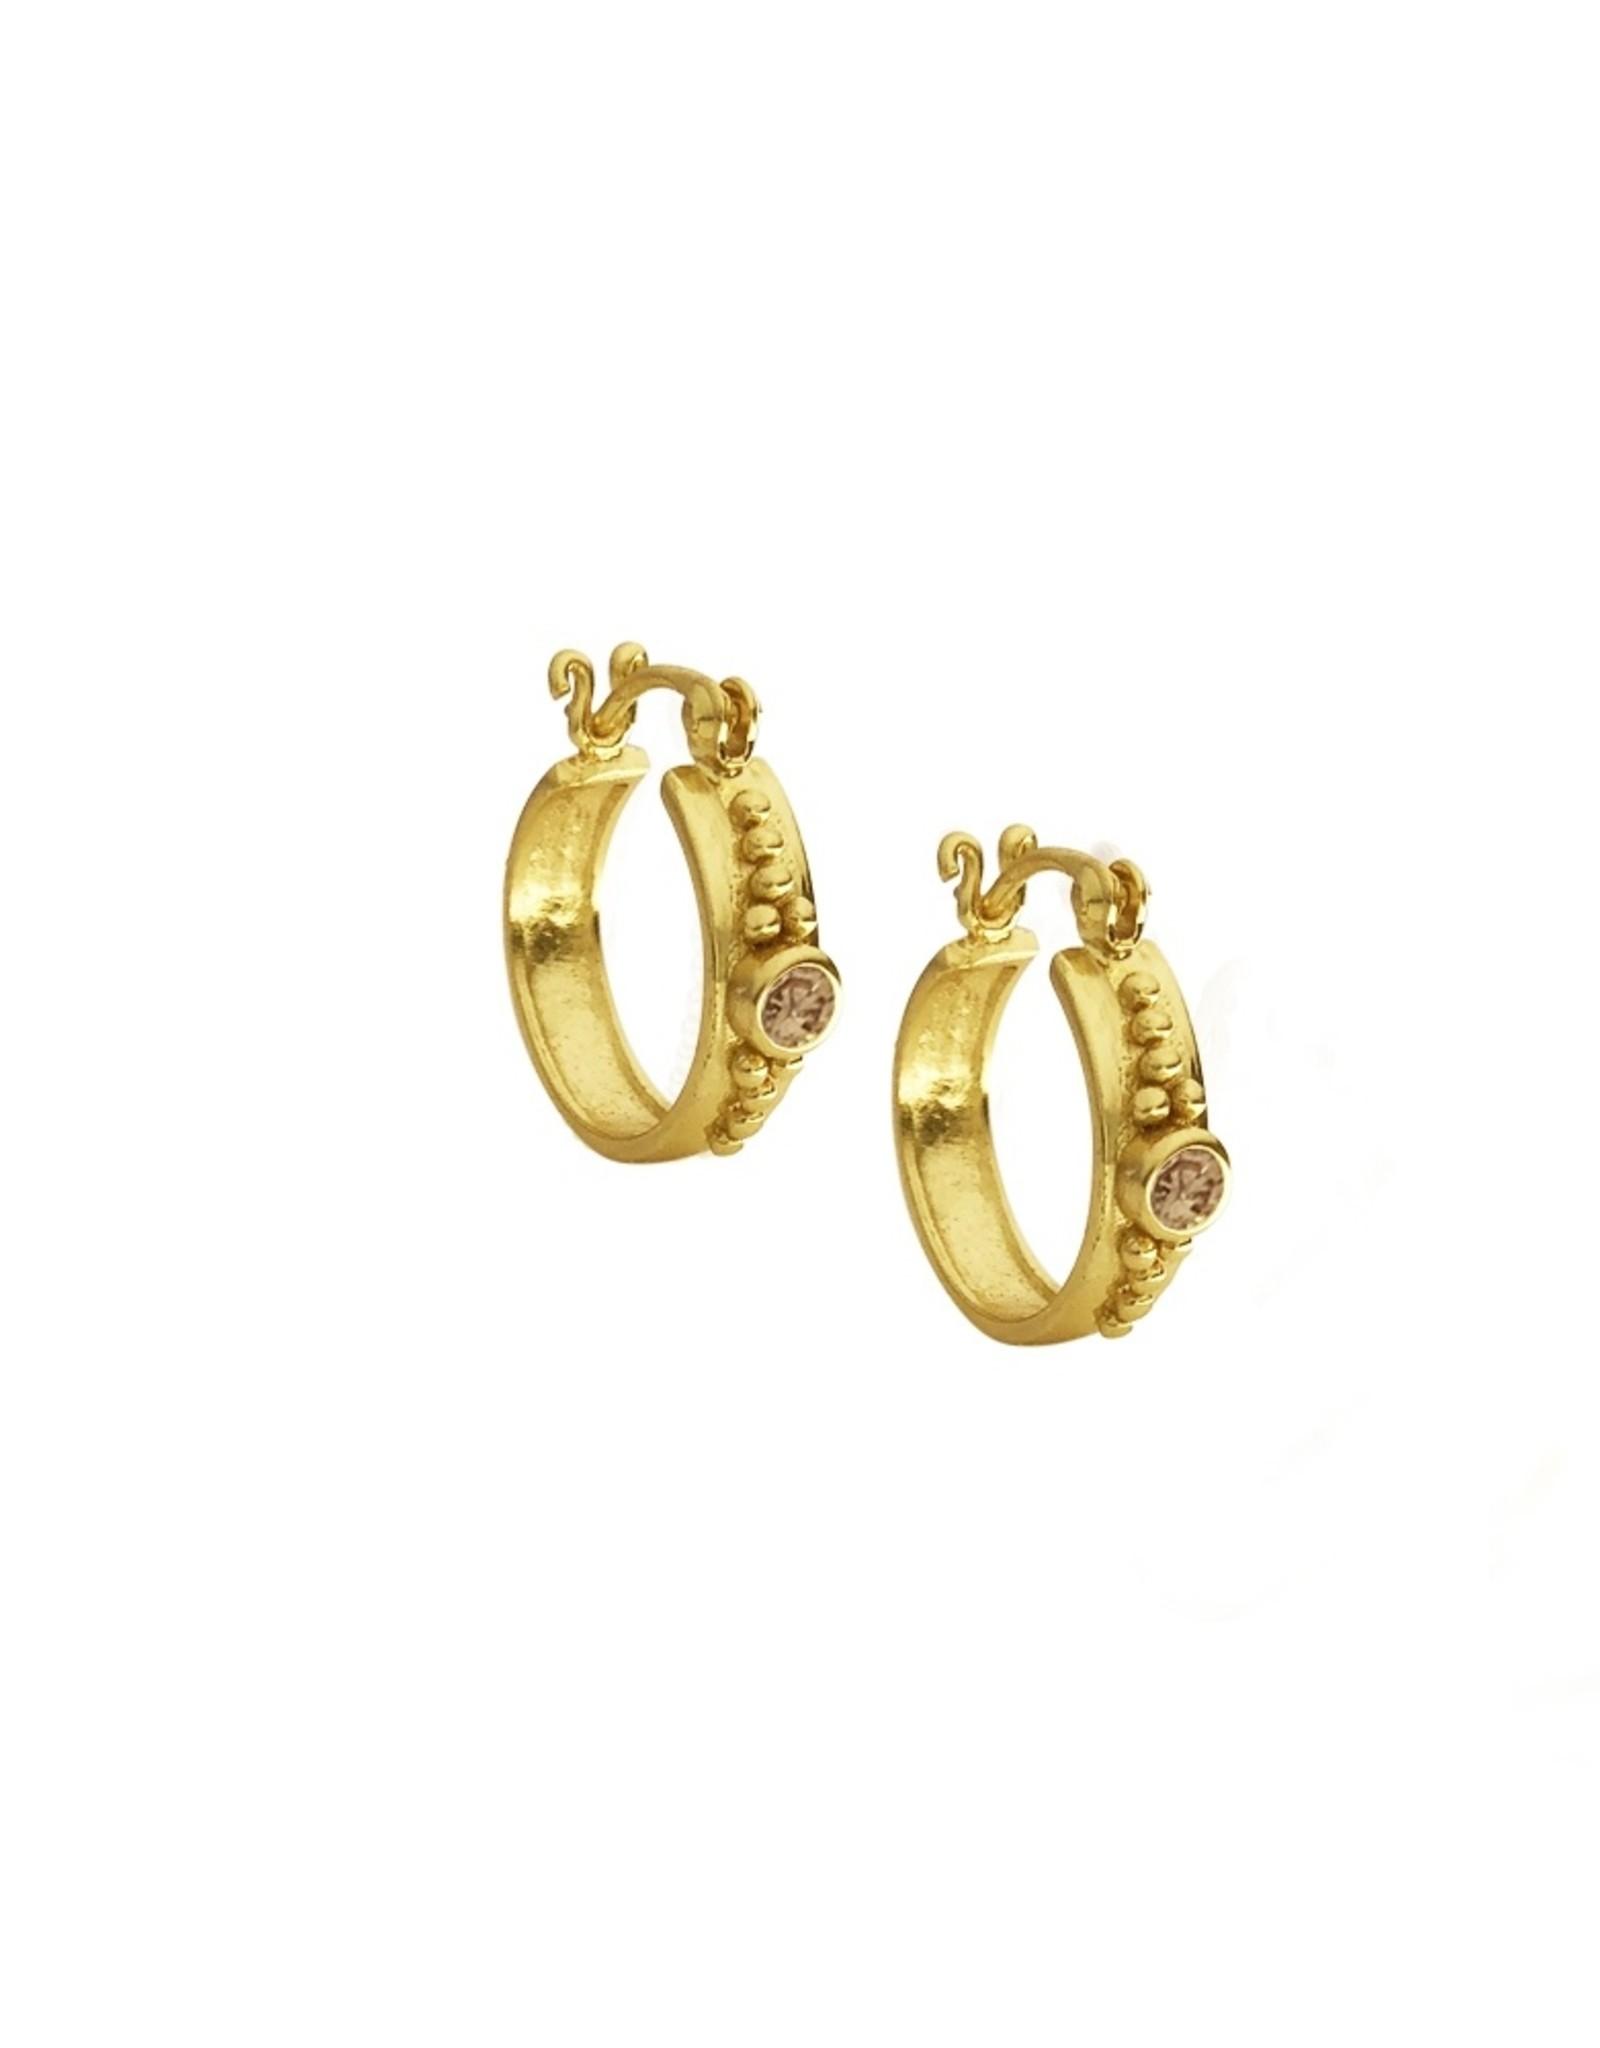 Zirkonia stone champagne gold